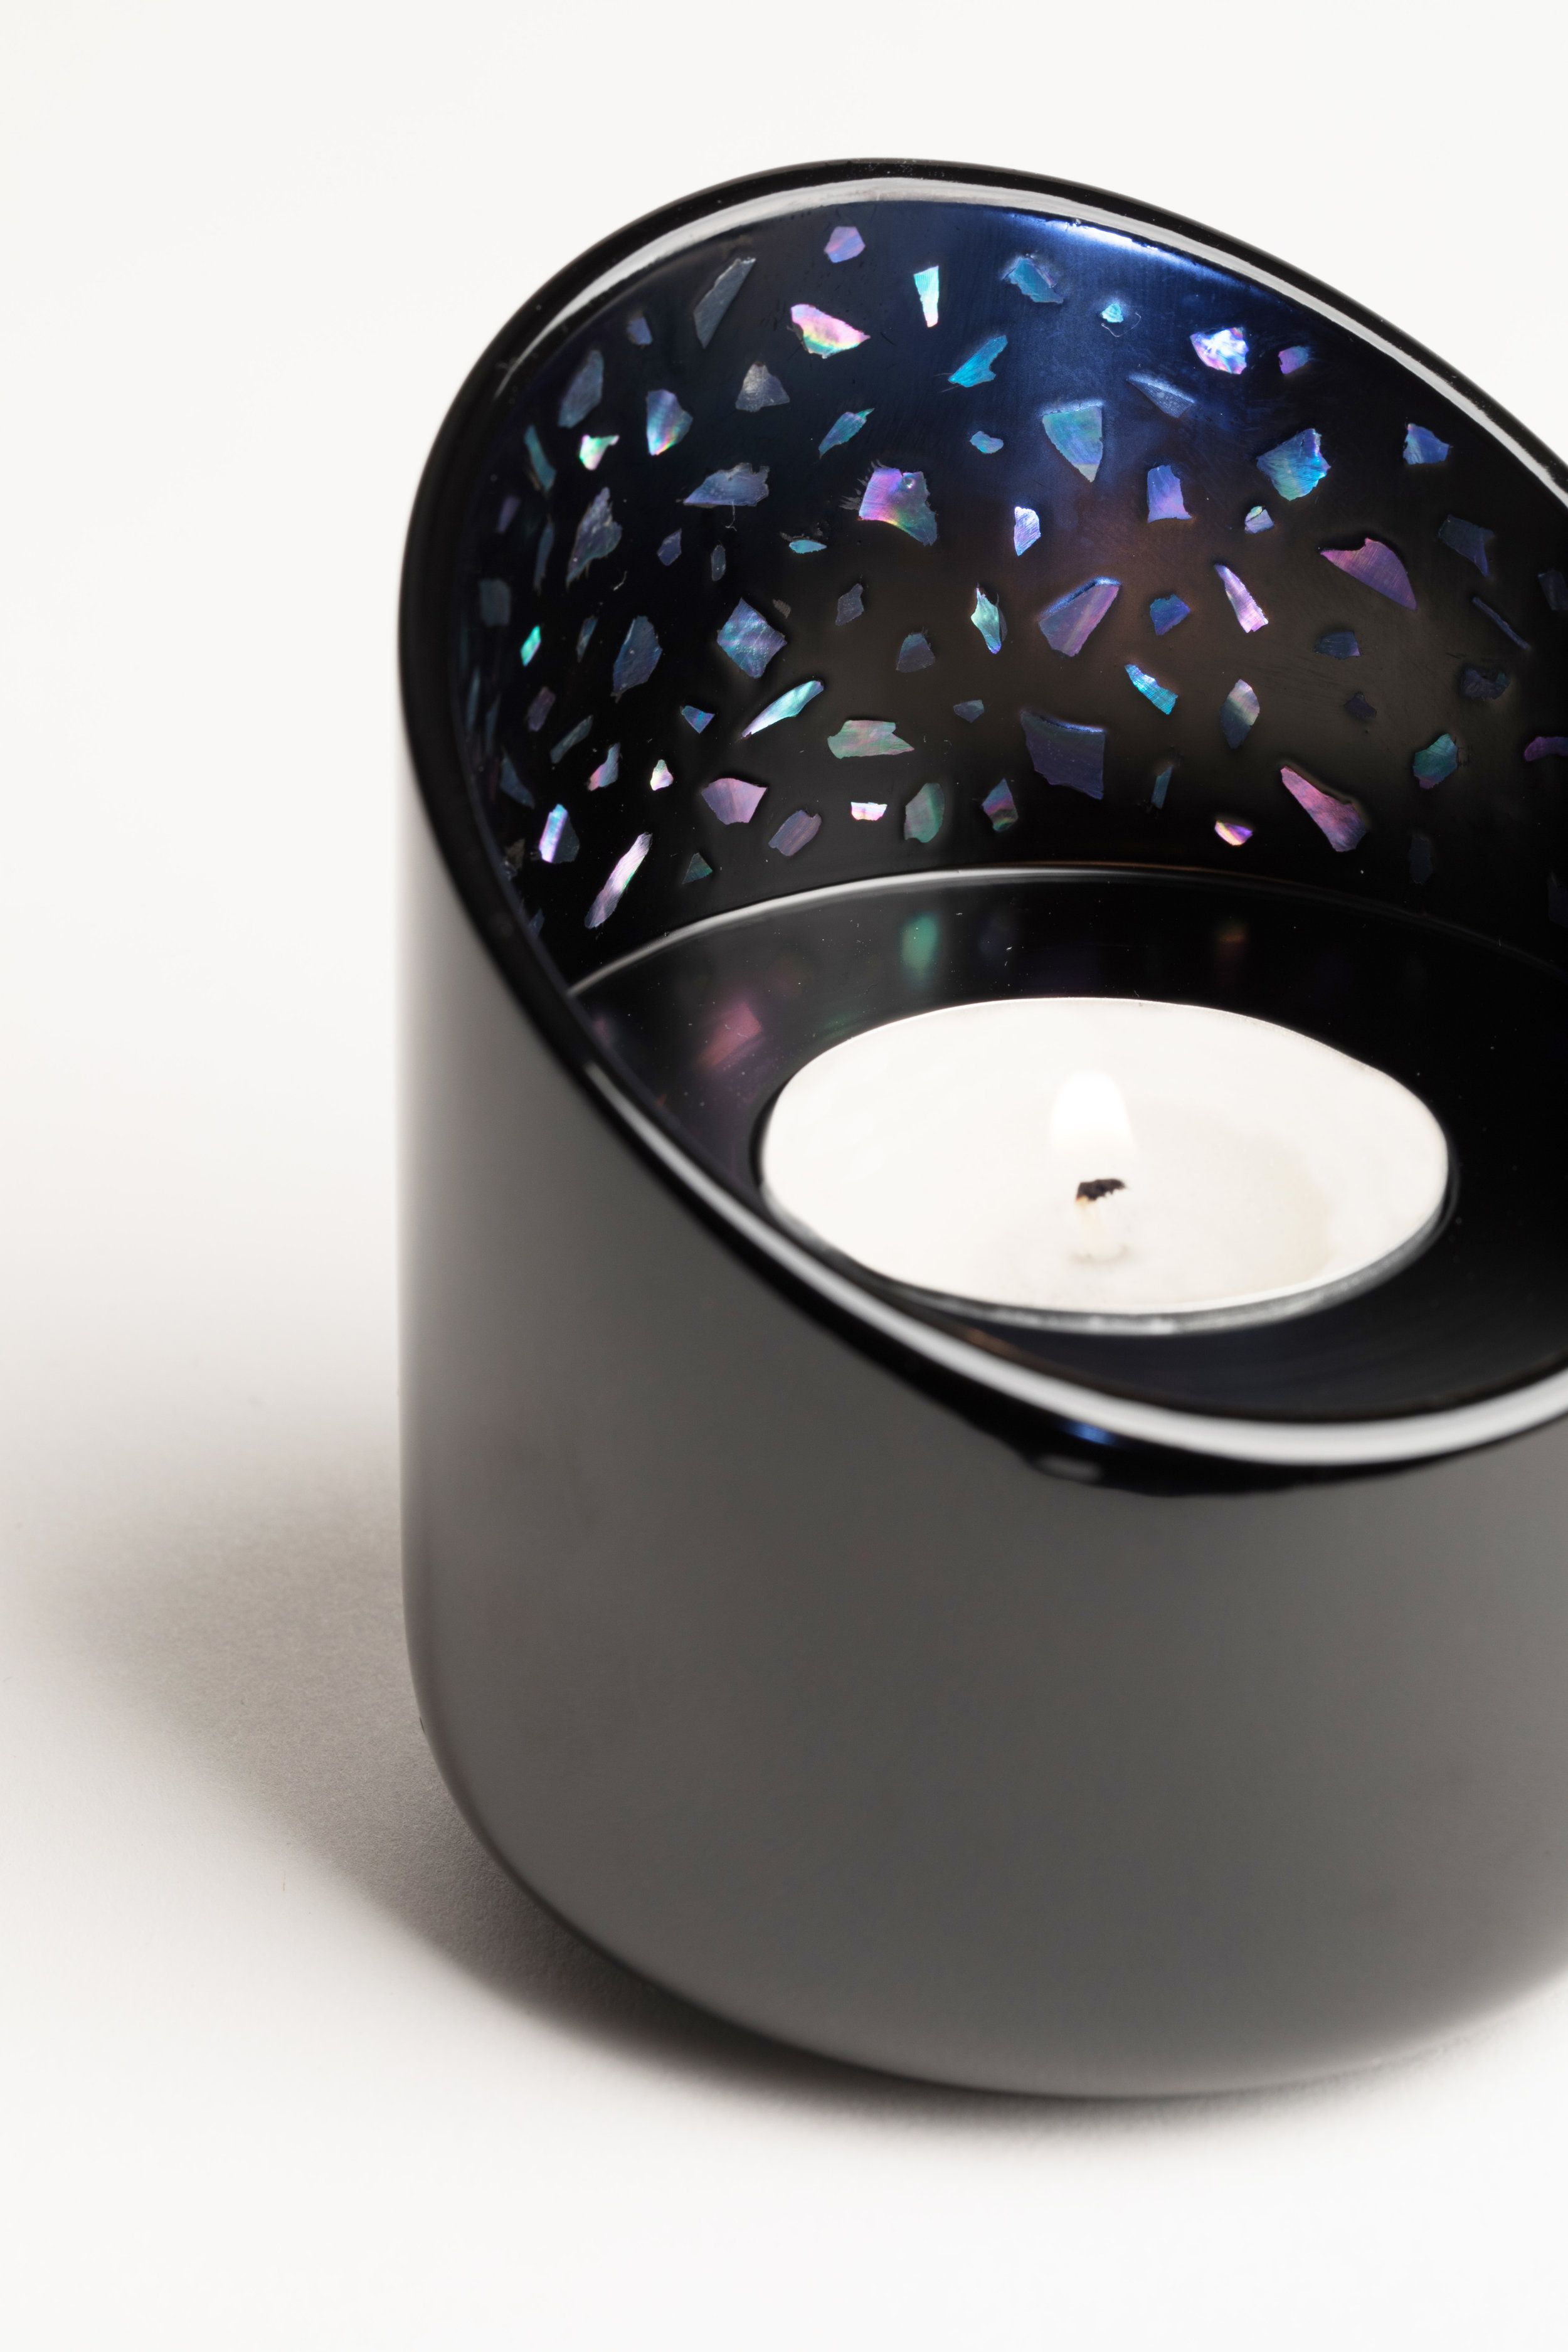 Atelier Takumi - Orion Candle holder medium_ Crafted by Raden Musashigawa designed by VoisinGuillemin 1.jpg